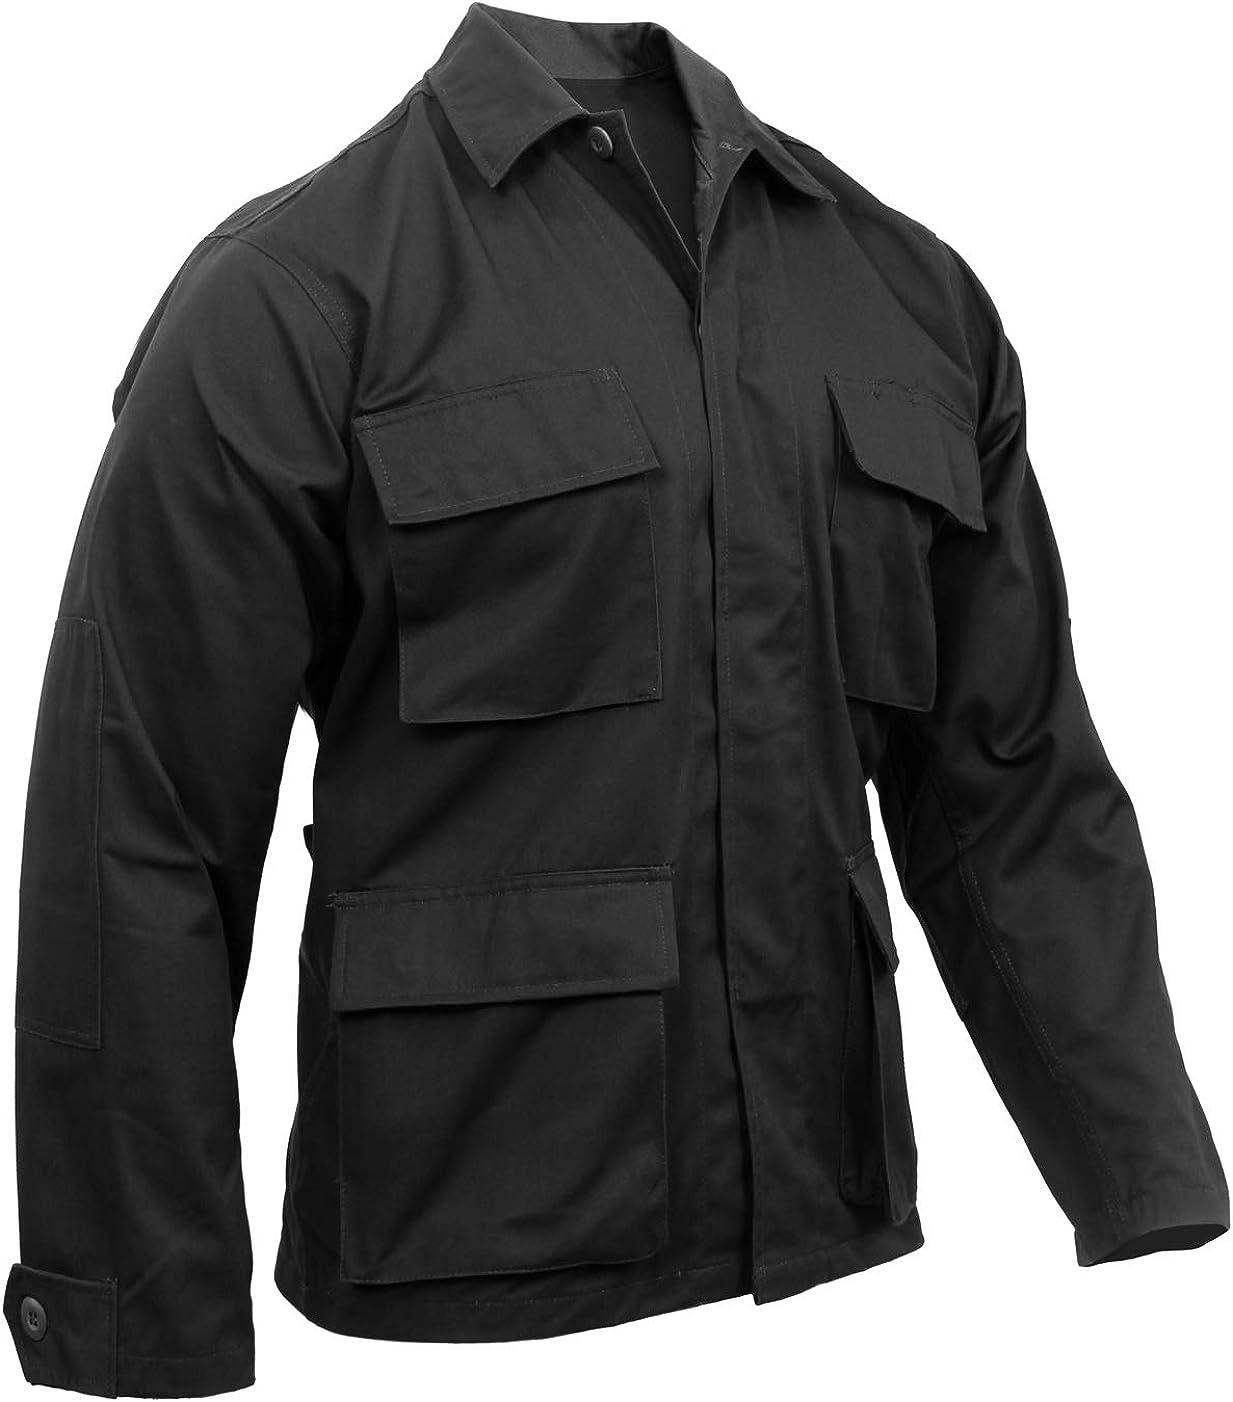 Rothco Solid BDU (Battle Dress Uniform) Military Shirts: Clothing